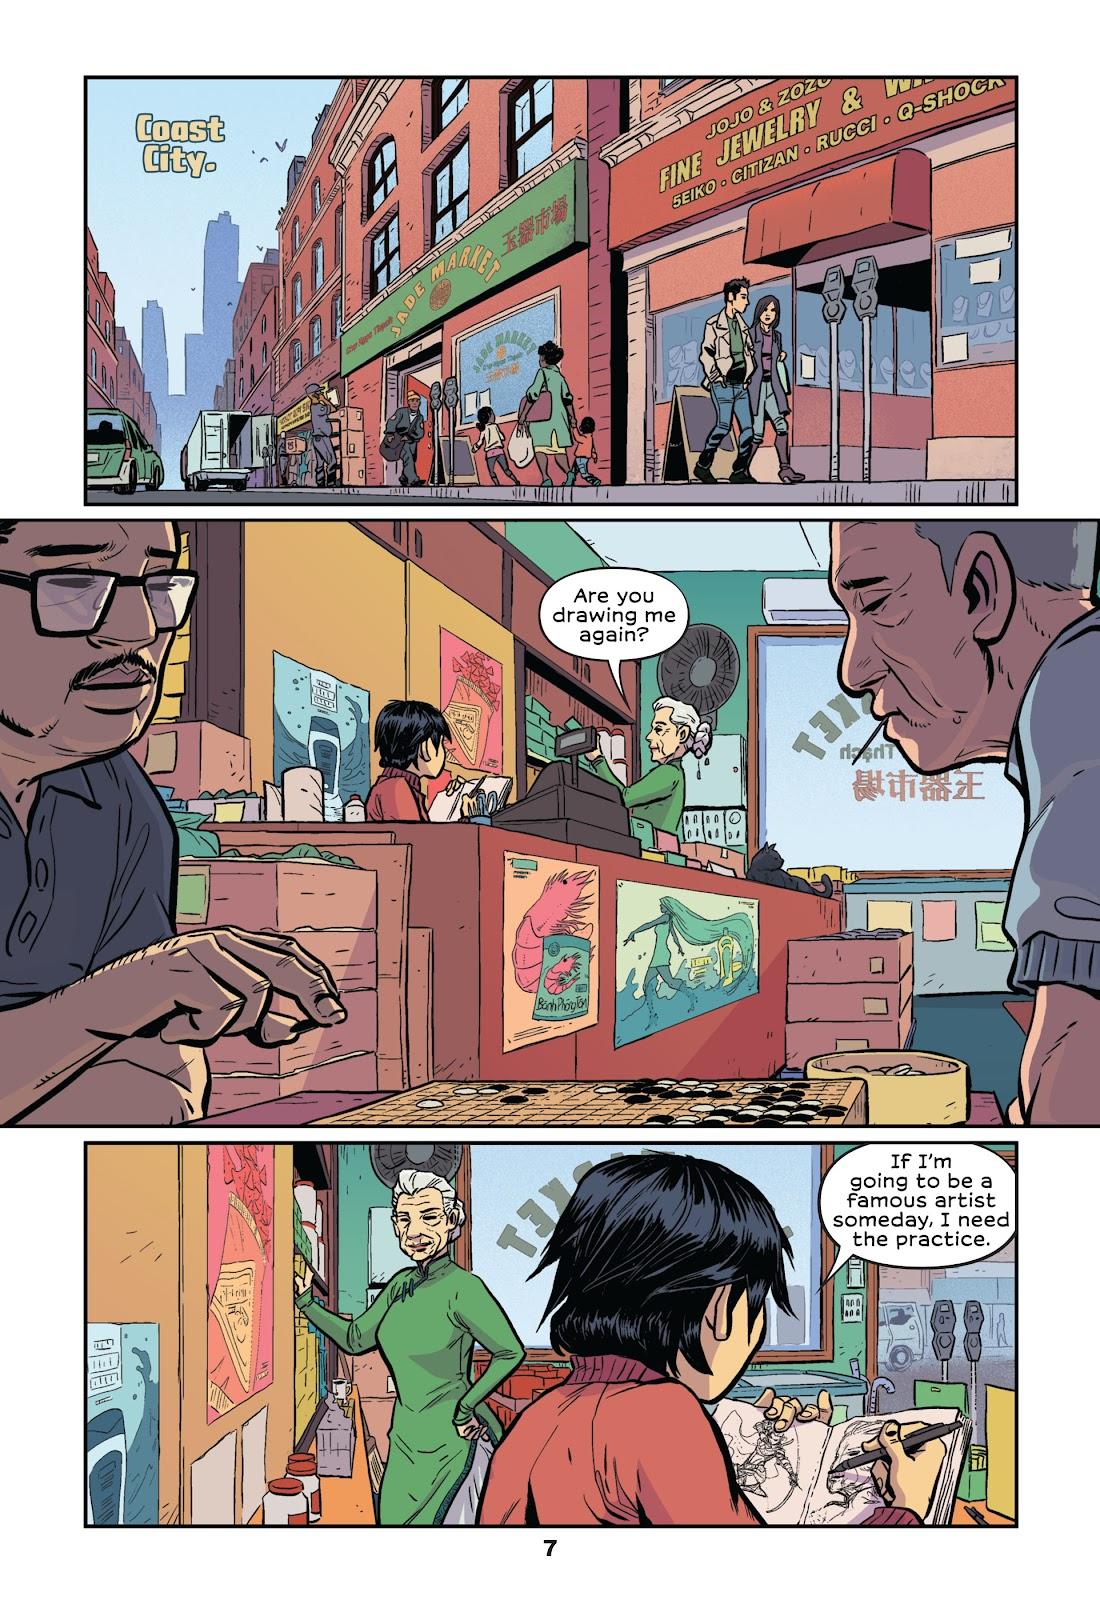 Read online Green Lantern: Legacy comic -  Issue # TPB - 6